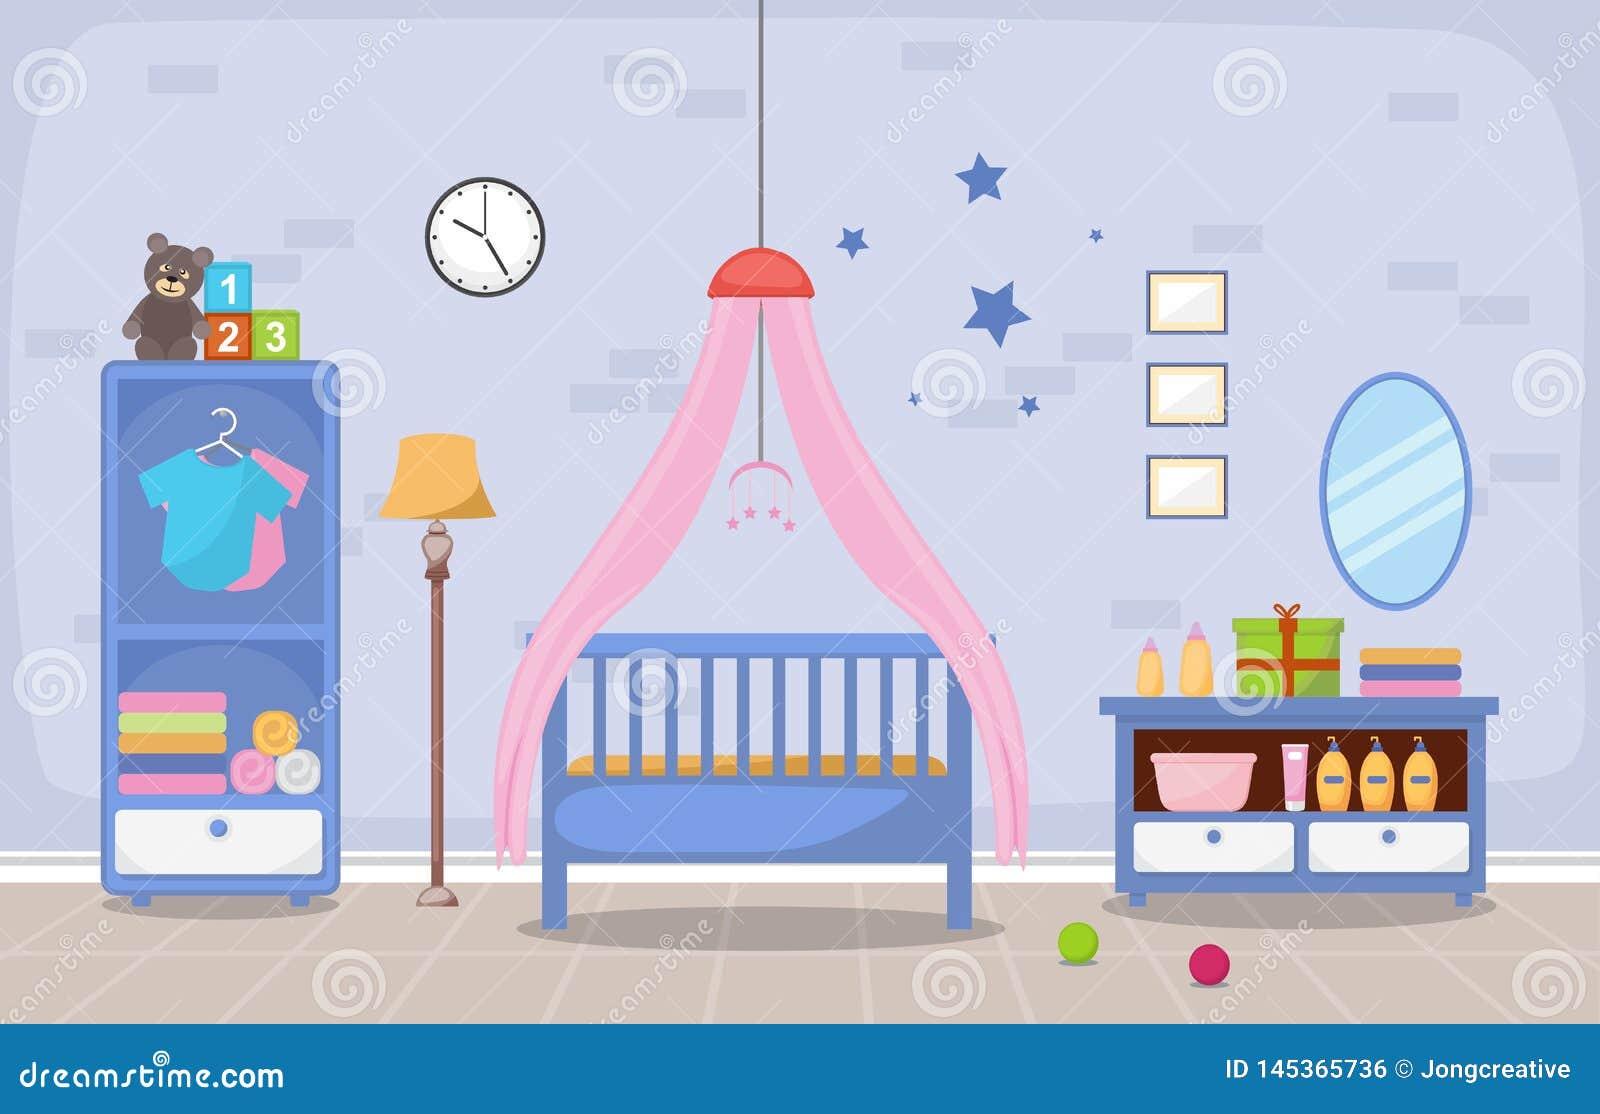 Image of: Baby Toddler Children Bedroom Interior Room Furniture Flat Design Stock Vector Illustration Of Netting Chair 145365736